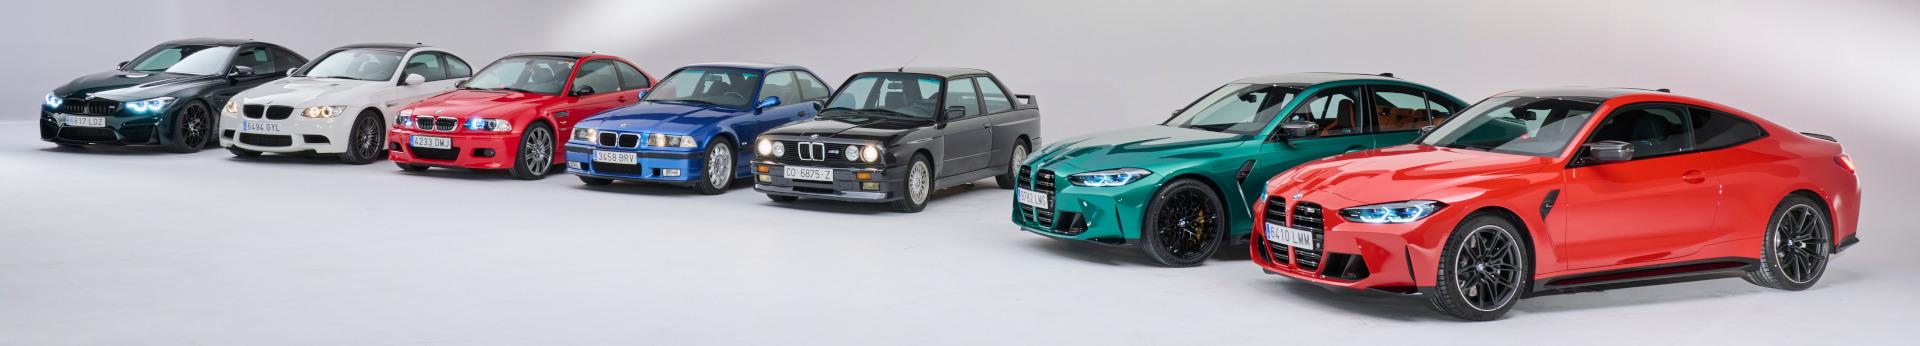 Name:  BMW-M3-M4-F82-E92-E46-E36-E30-G80-G82.jpg Views: 3211 Size:  162.3 KB